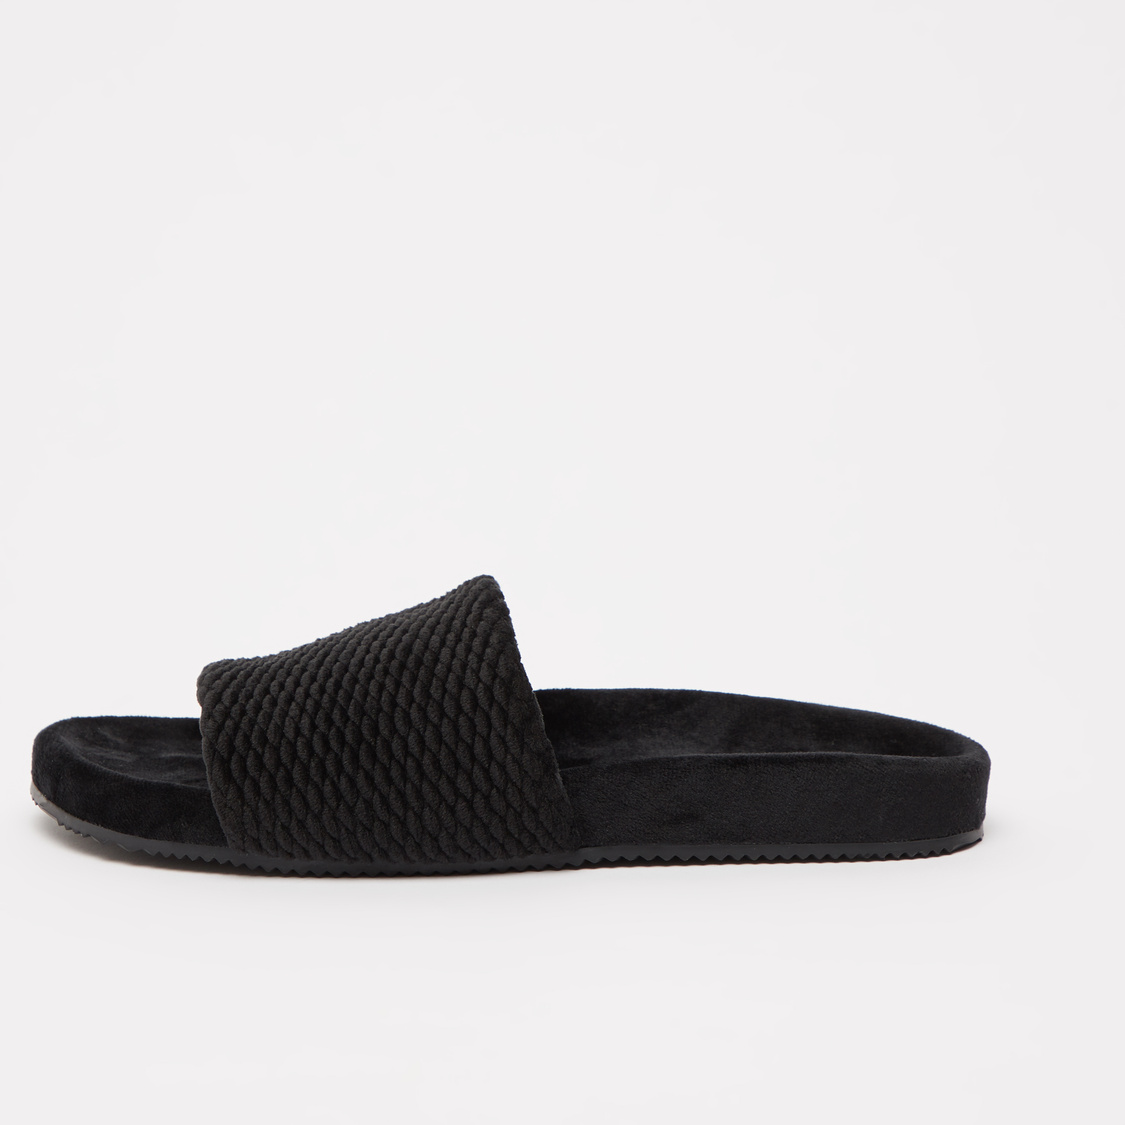 Textured Slip-On Bedroom Slides